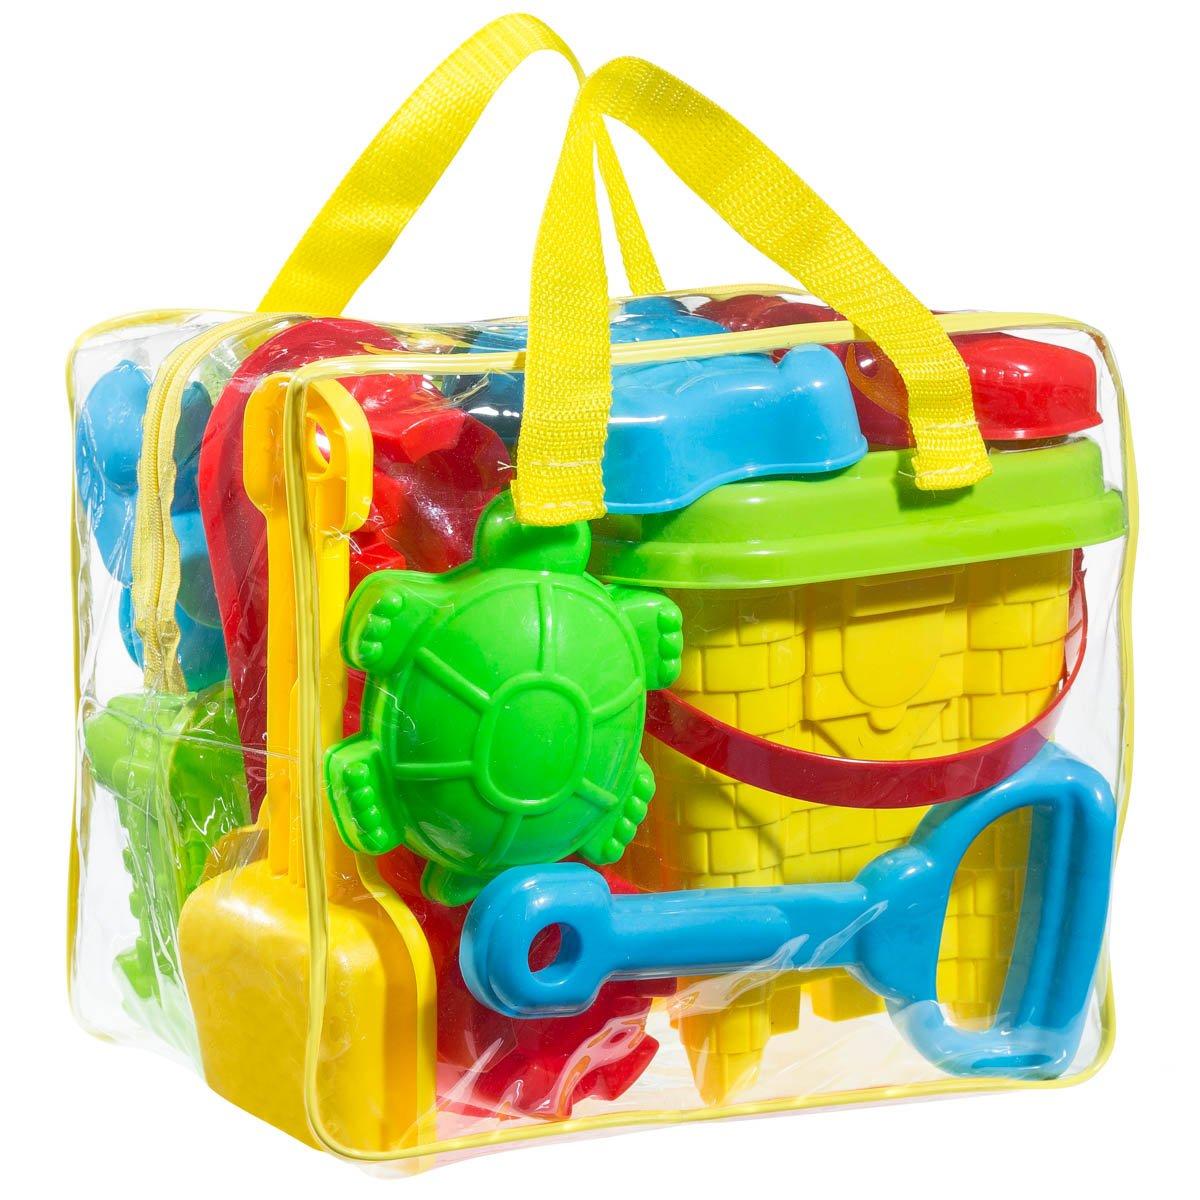 FoxPrint Beach sand toy set Models and Molds Bucket, Shovels,